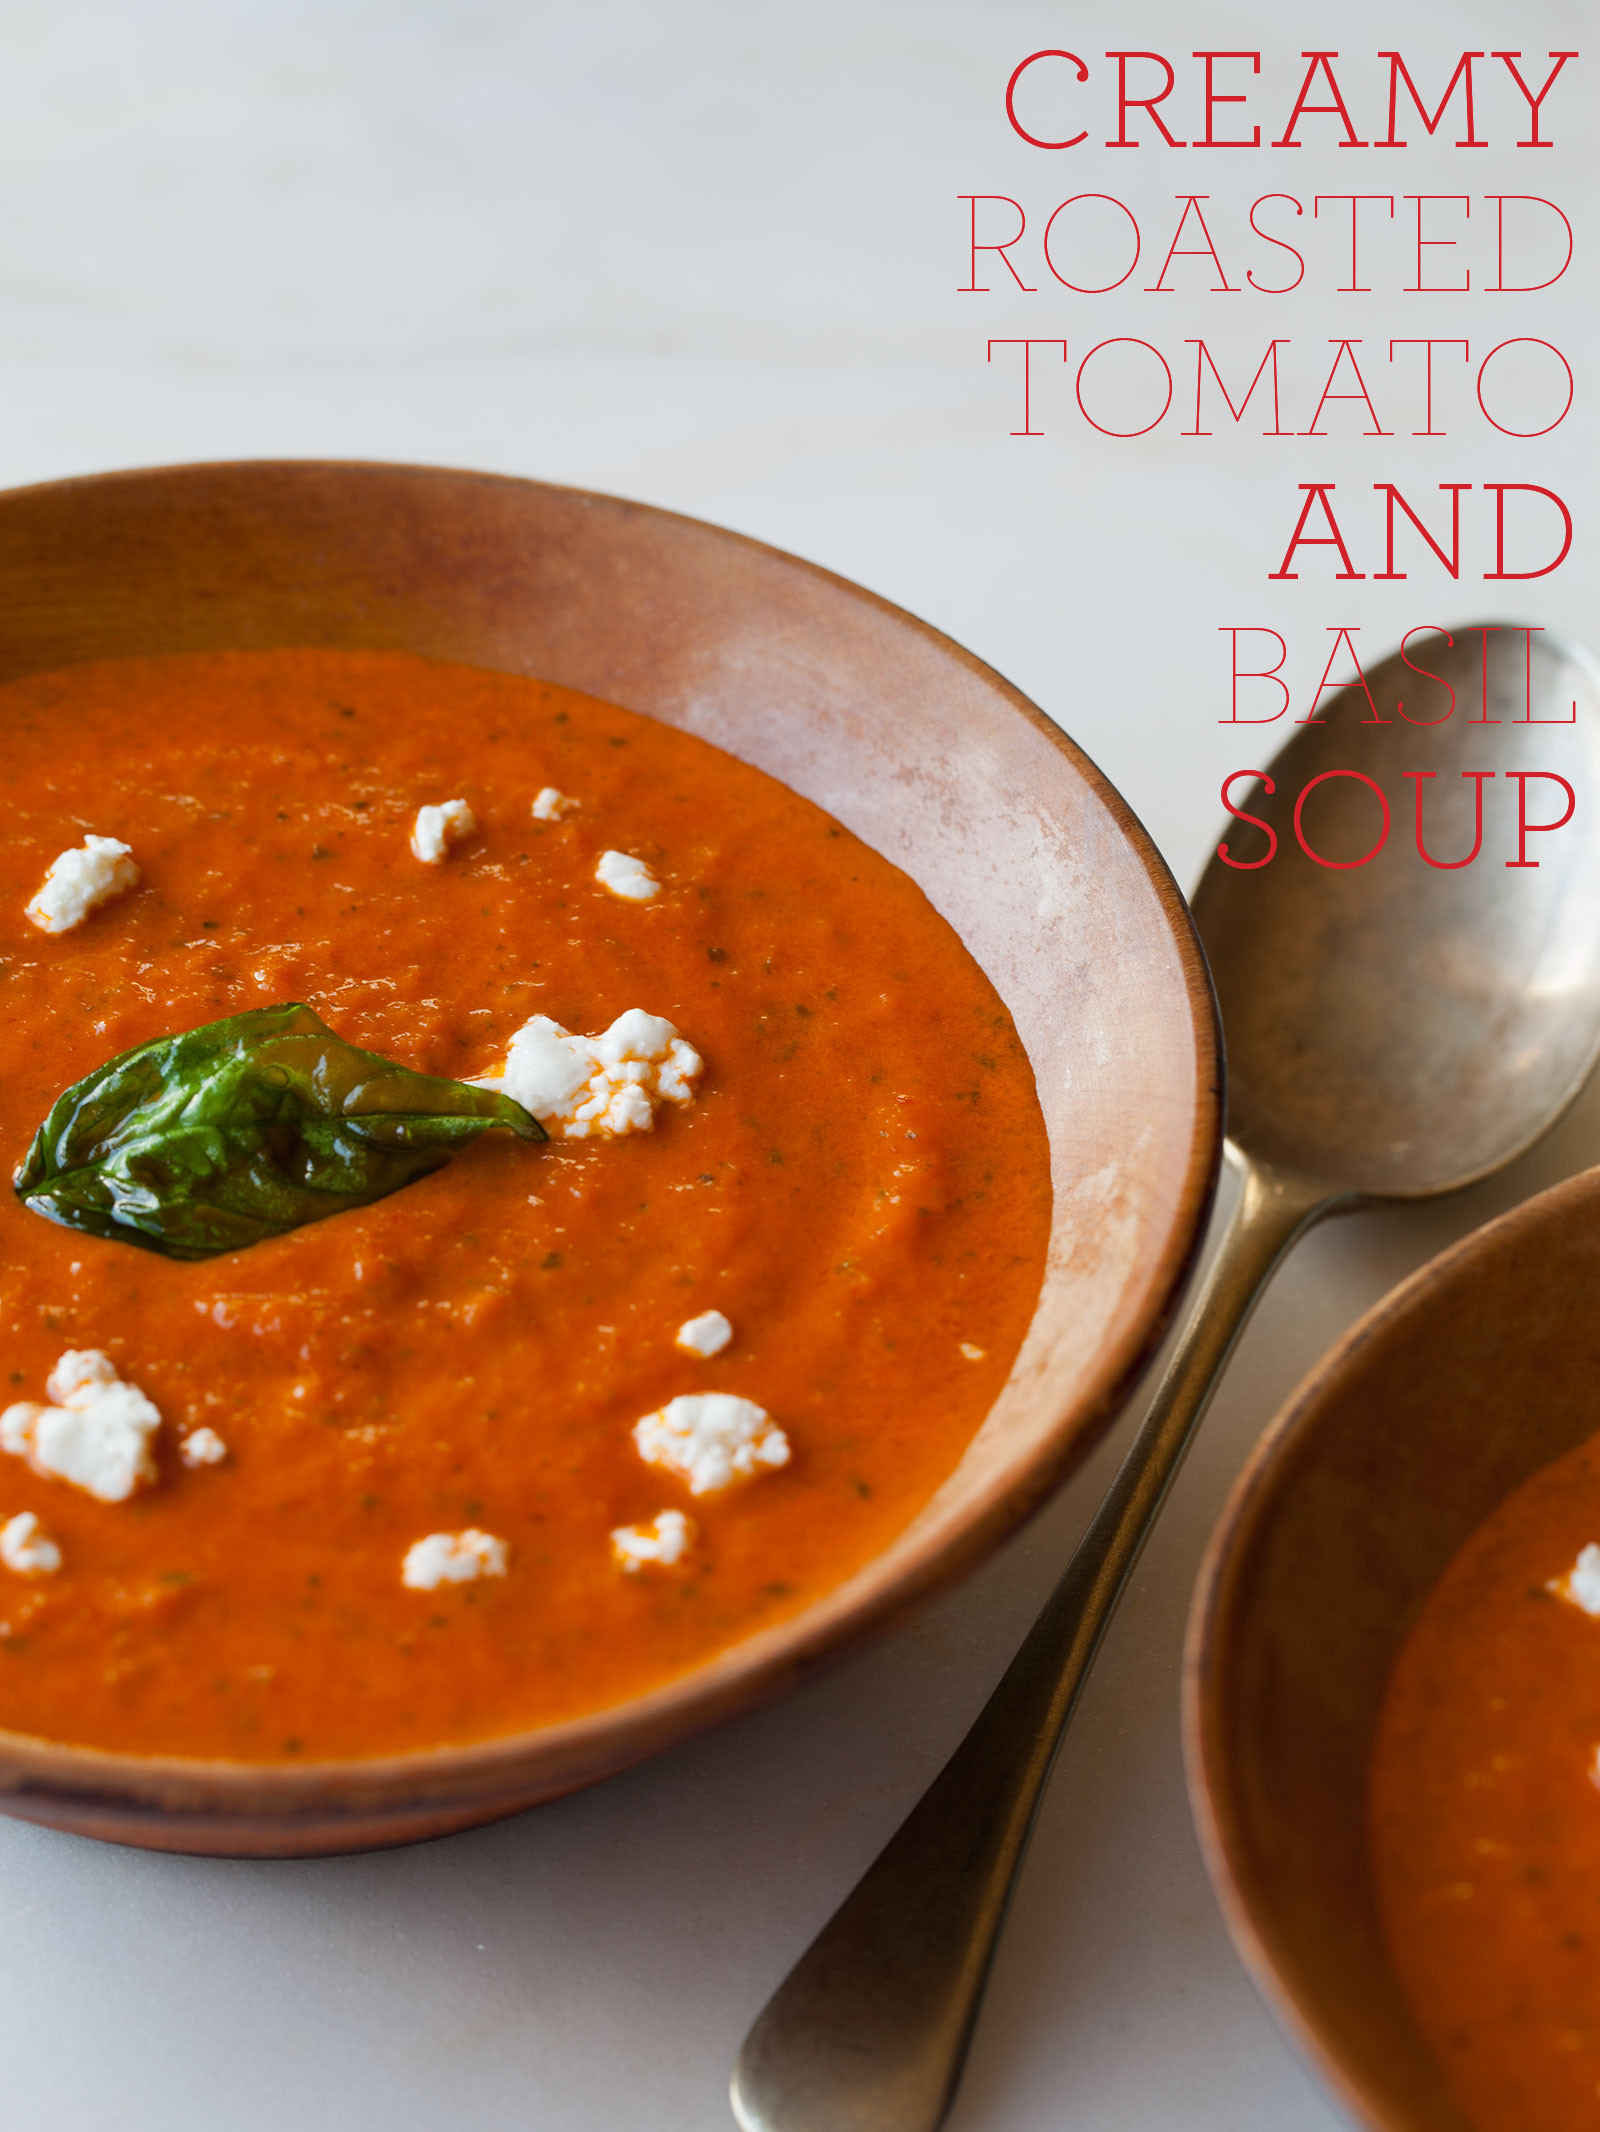 Creamy Tomato Basil Soup  Creamy Roasted Tomato & Basil Soup